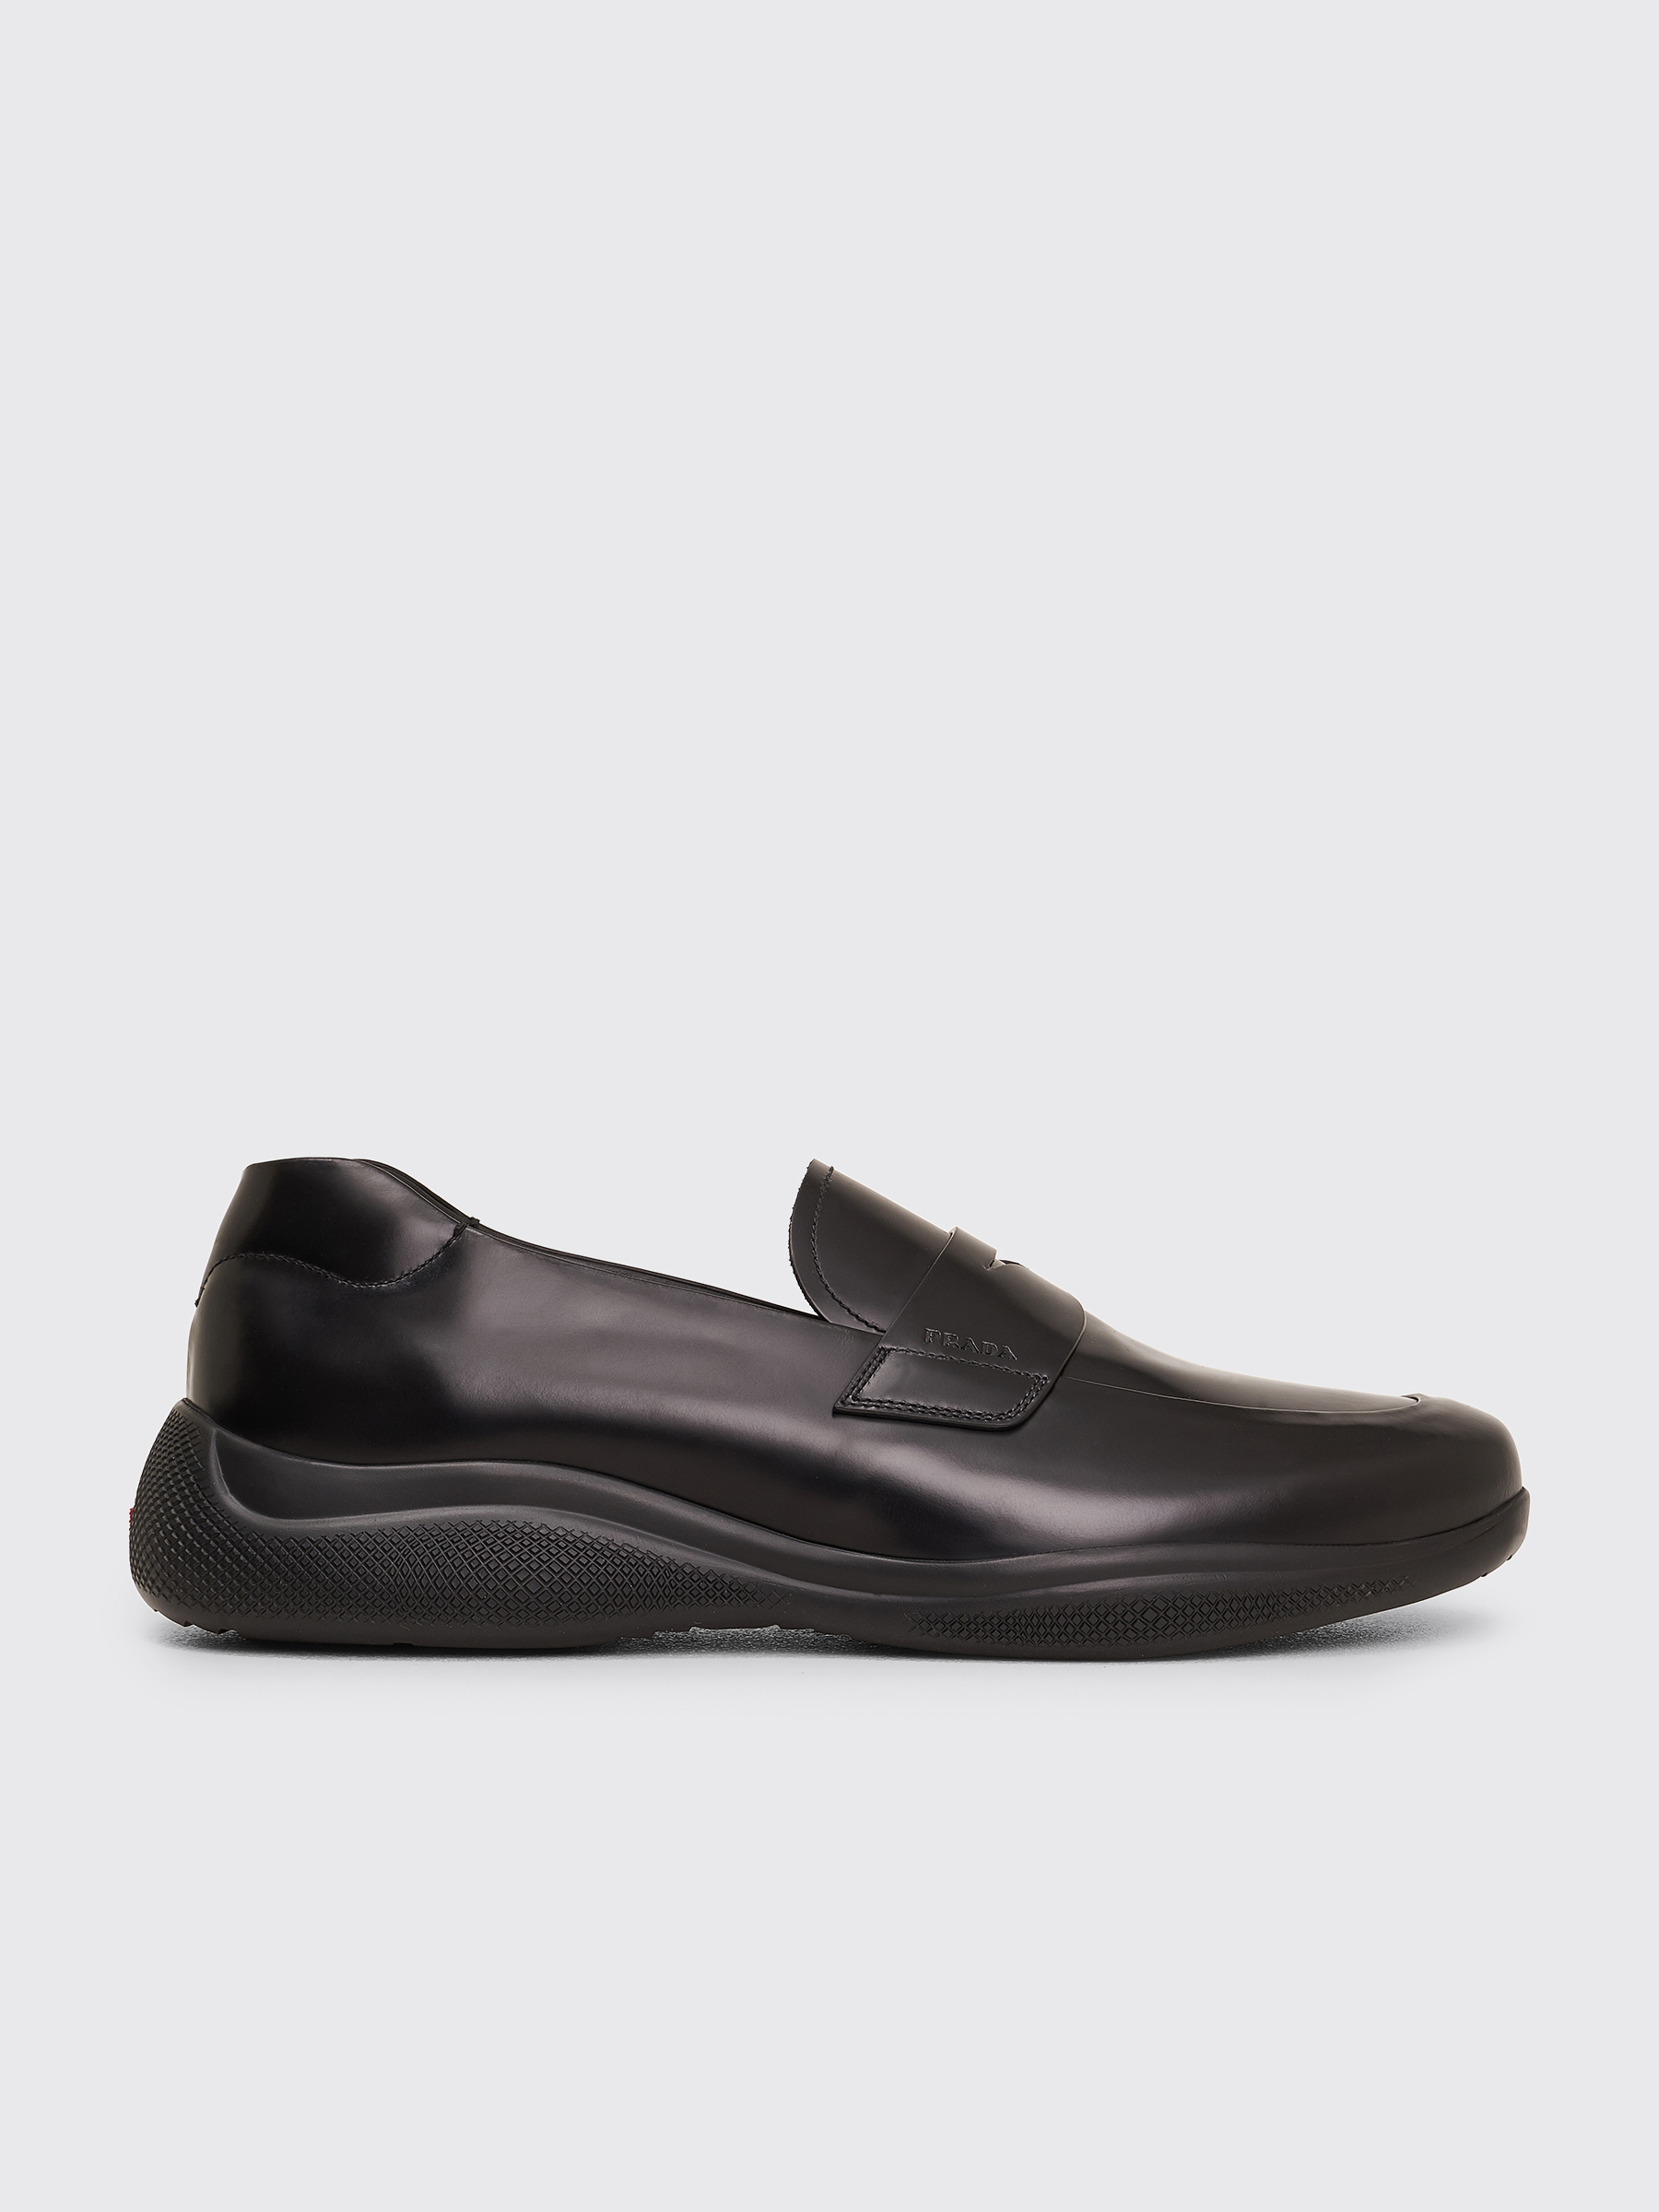 Prada Brushed Leather Sport Loafers Black